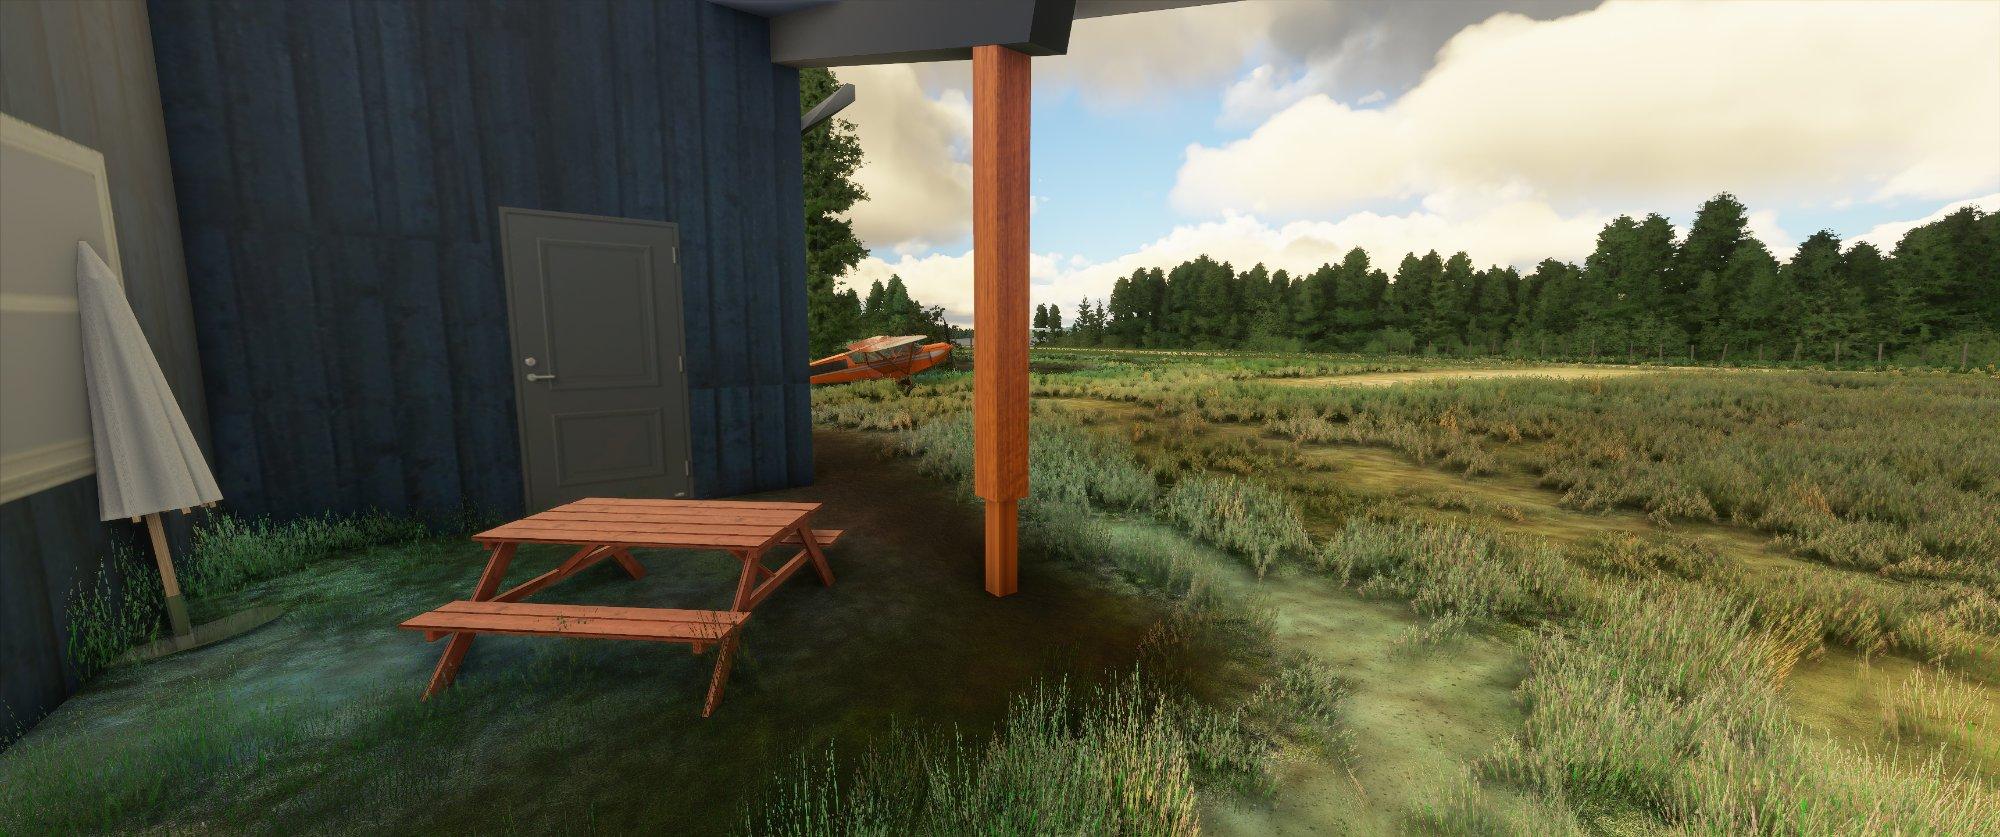 Microsoft Flight Simulator Screenshot 2020.10.03 - 00.33.37.38.jpg